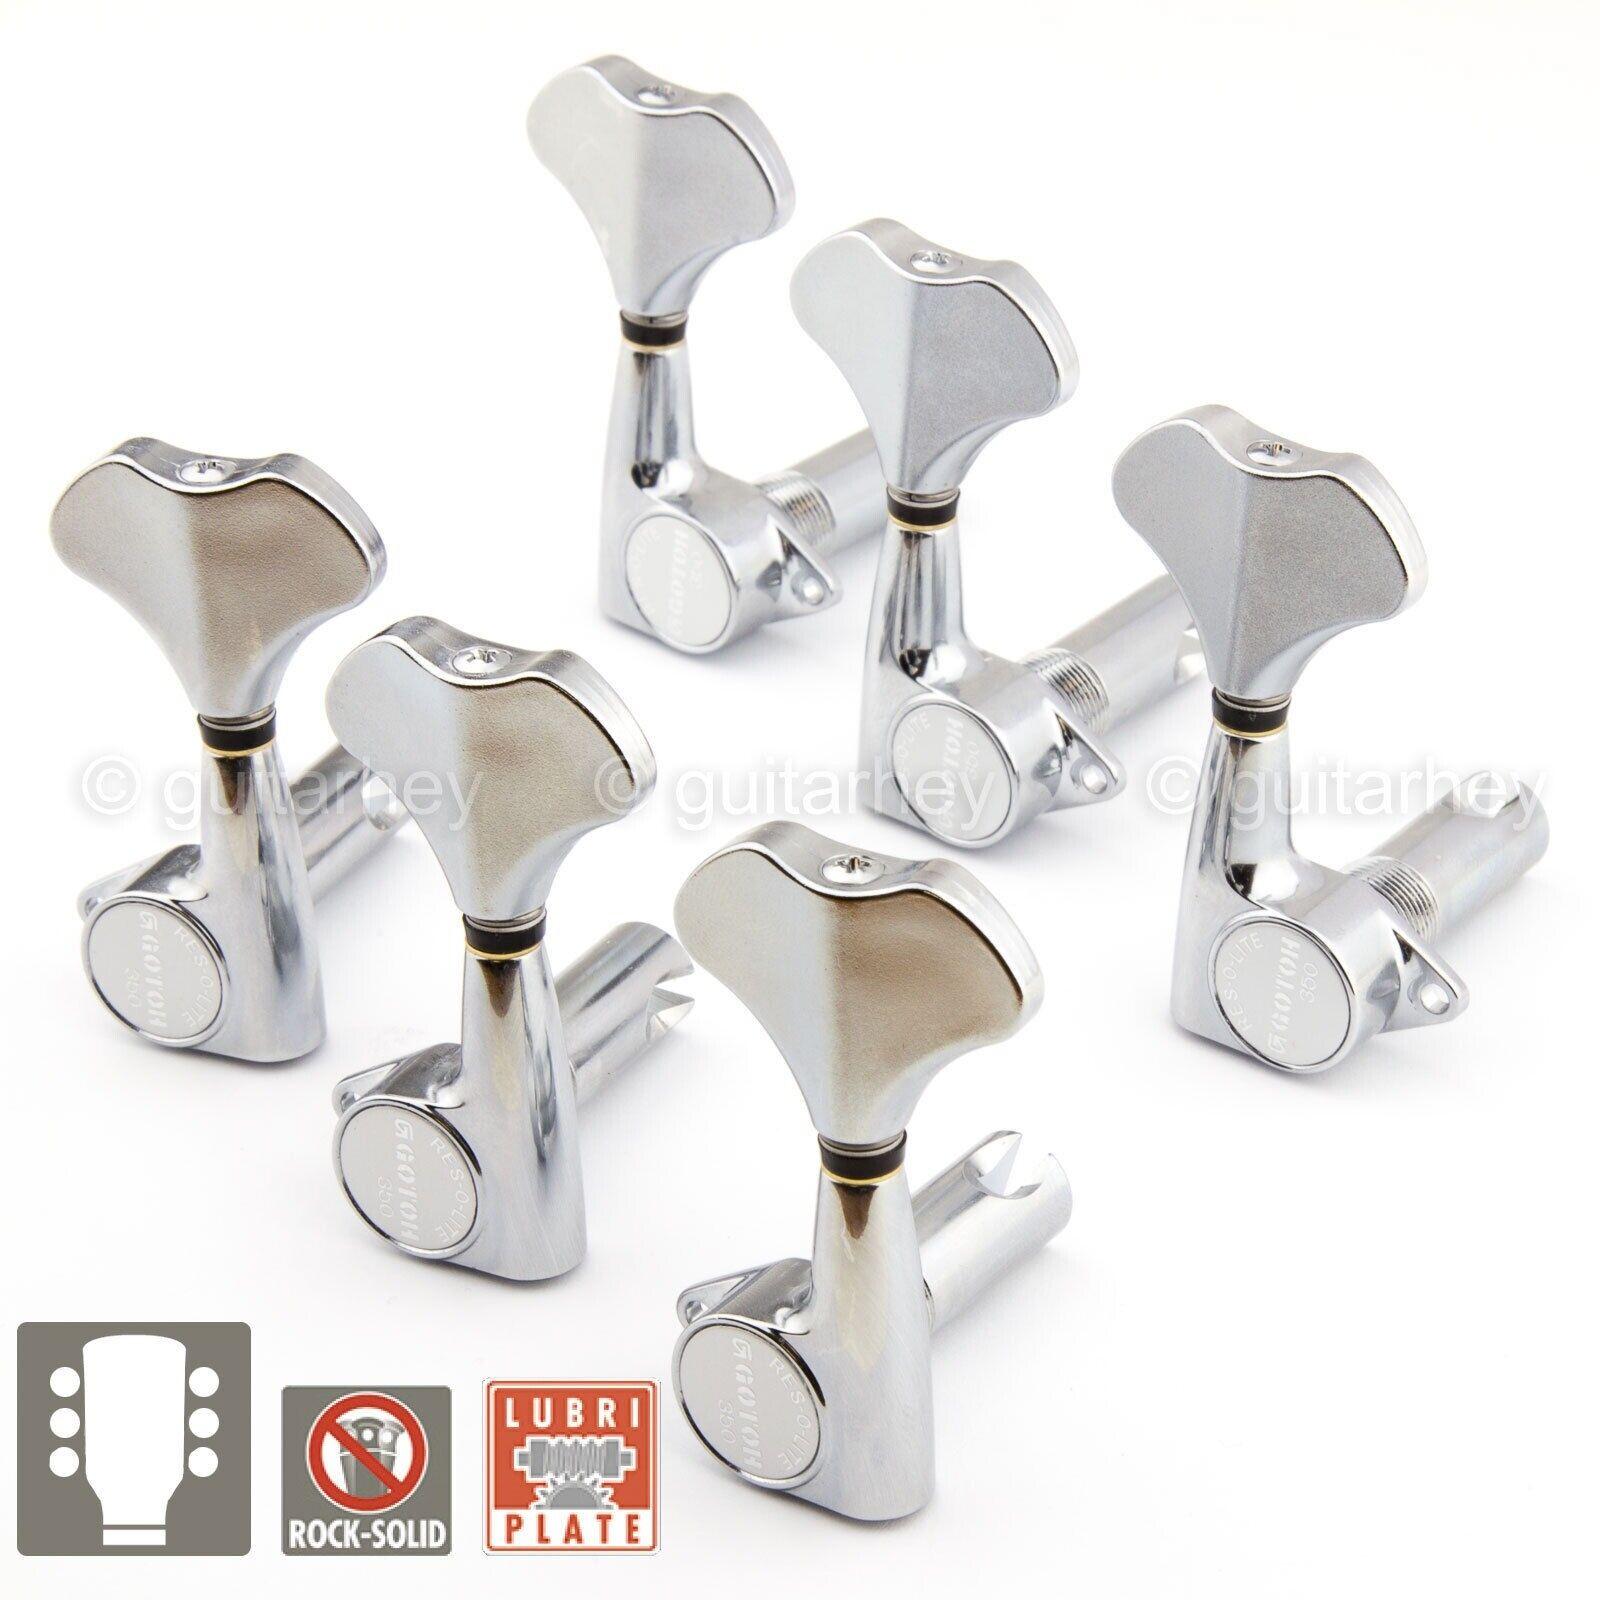 NEW Gotoh GB350 RES-O-LITE Aluminum Bass 6-String Tuning Keys L3+R3 Set - CHROME